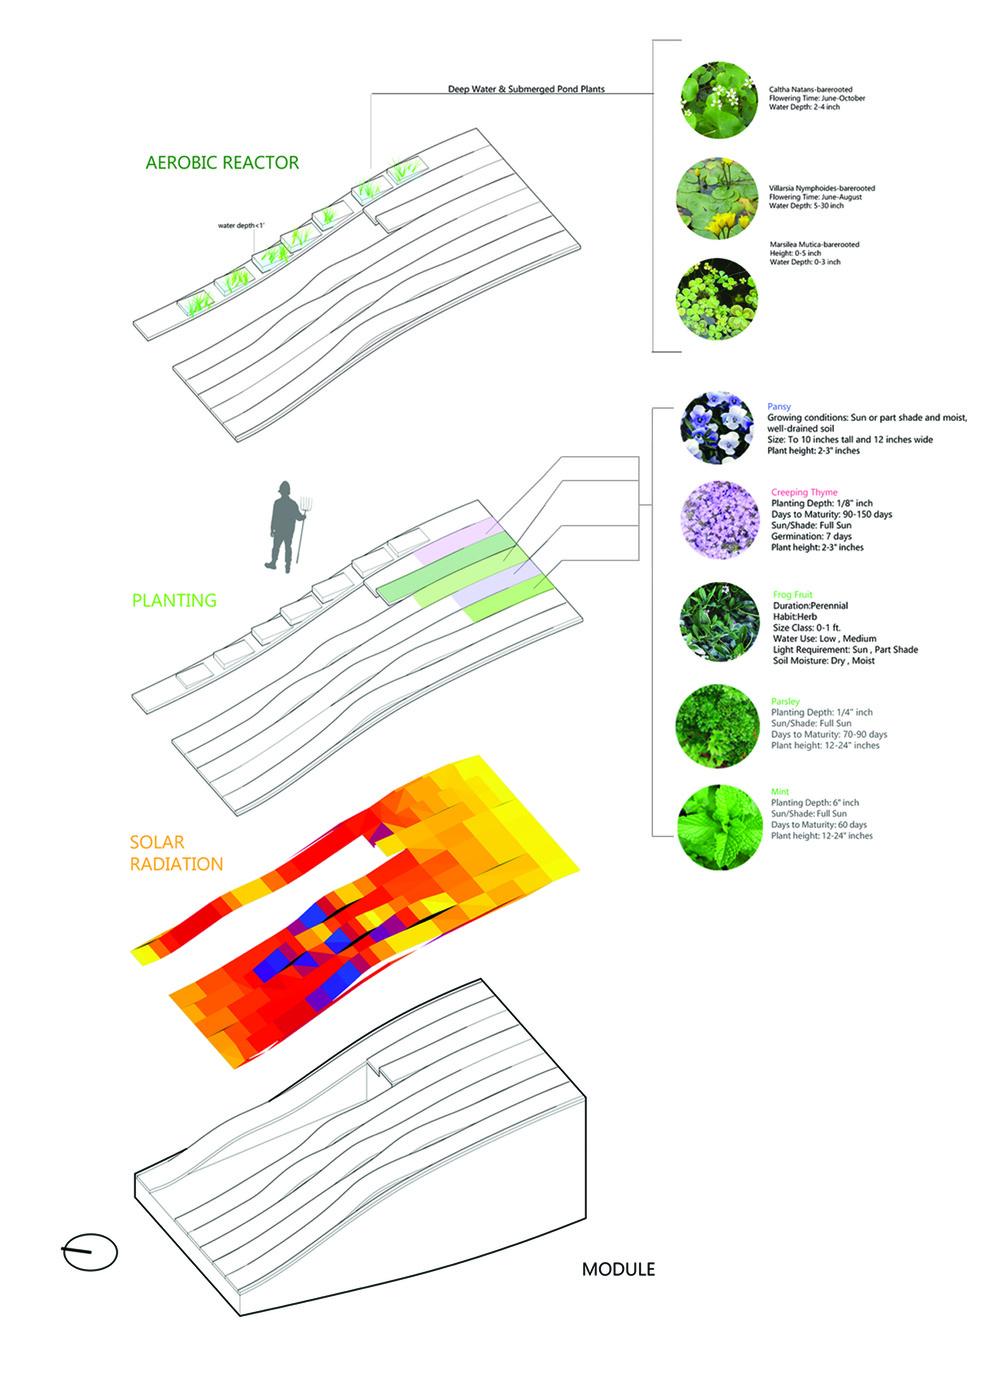 module analysis